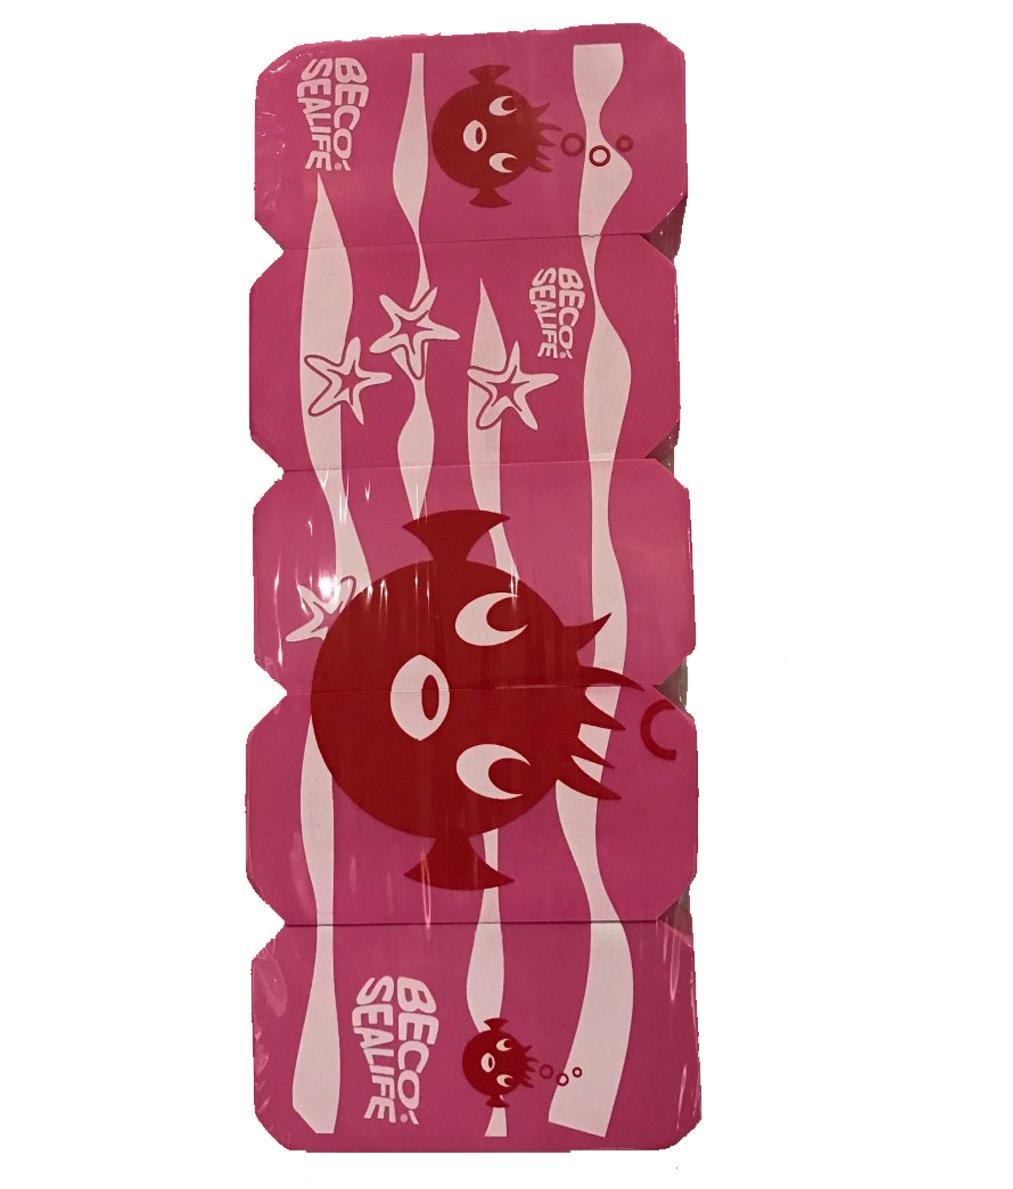 Beco Sealife Childrens Swimming Belt - Pink